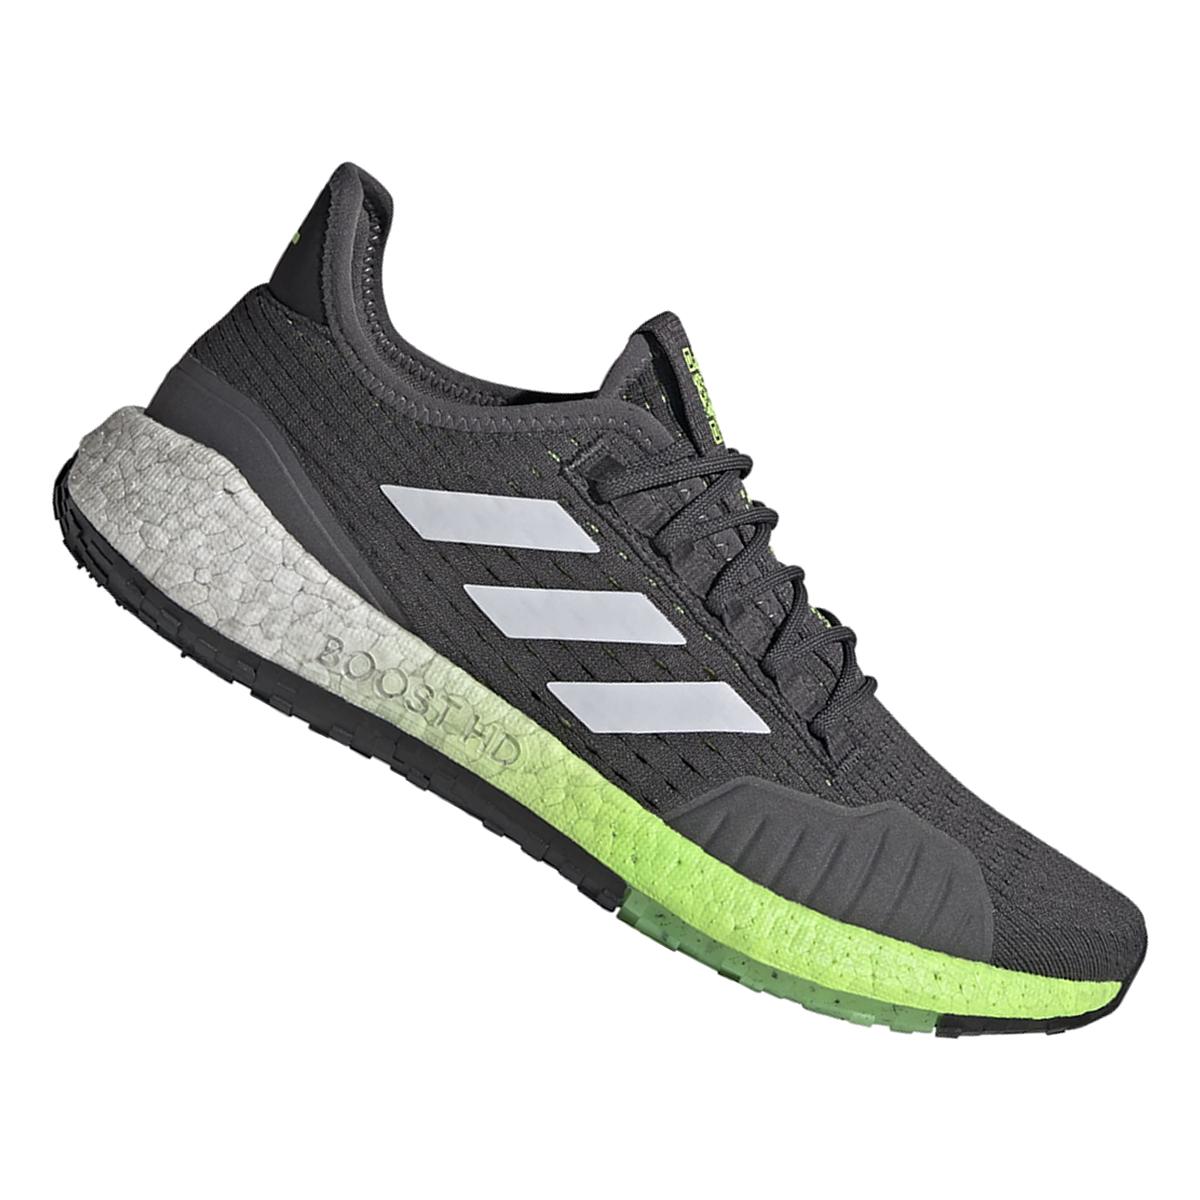 Chaussures de running Adidas Pulseboost HD - Tailles du 39 au 47